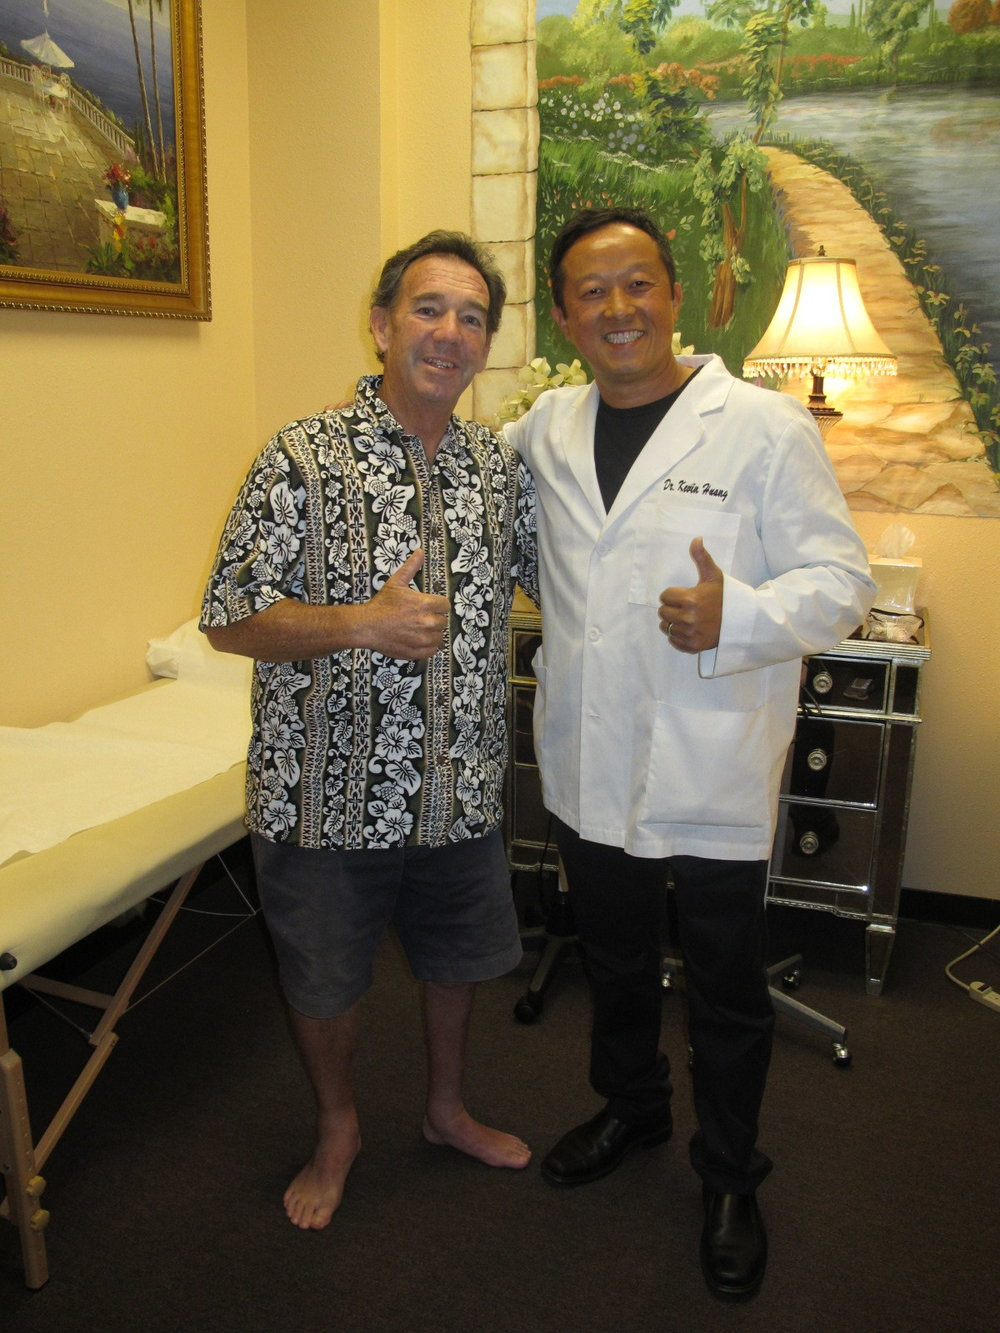 wheelchair-pain-spasms-debilitating-back-pain-acupuncture